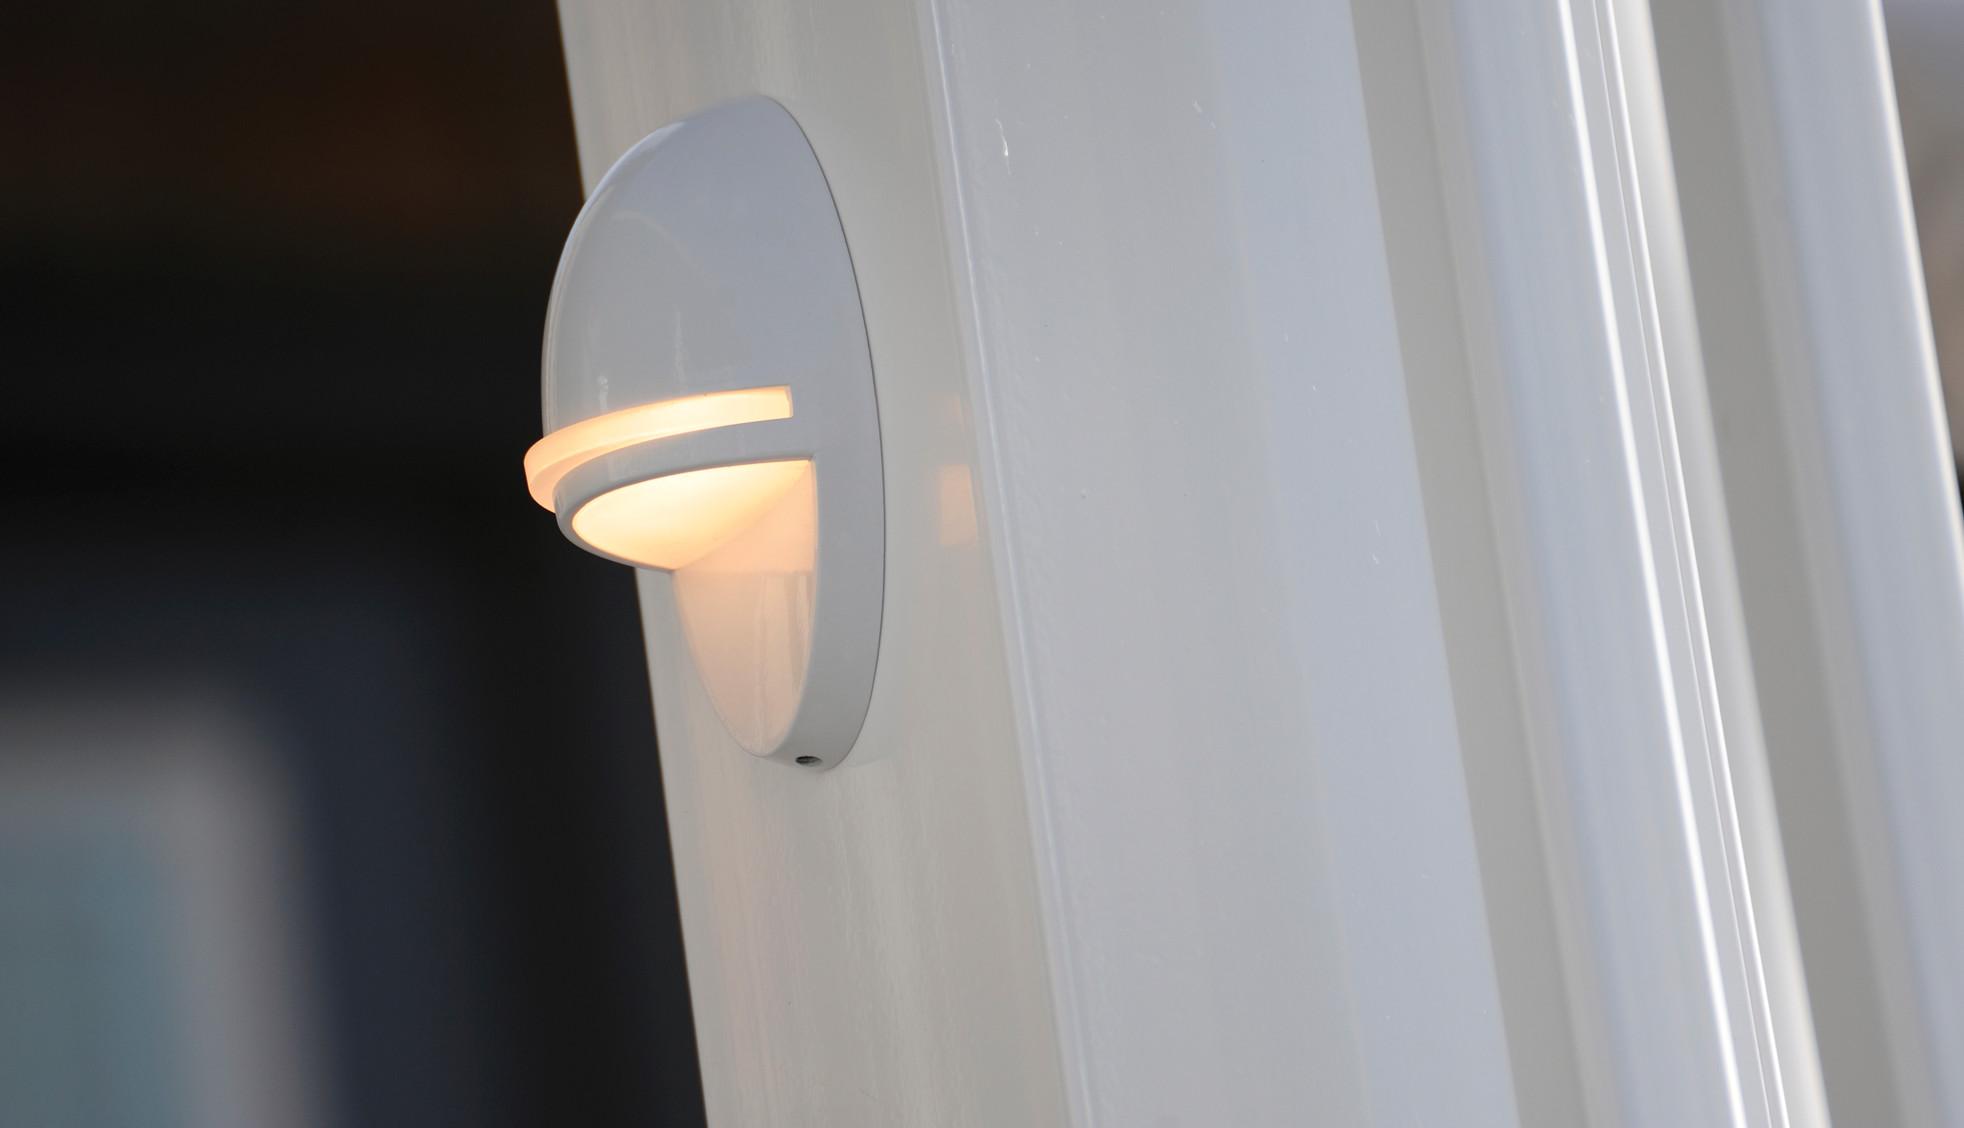 Luces decorativas para cubiertas de TimberTech: imagen 1